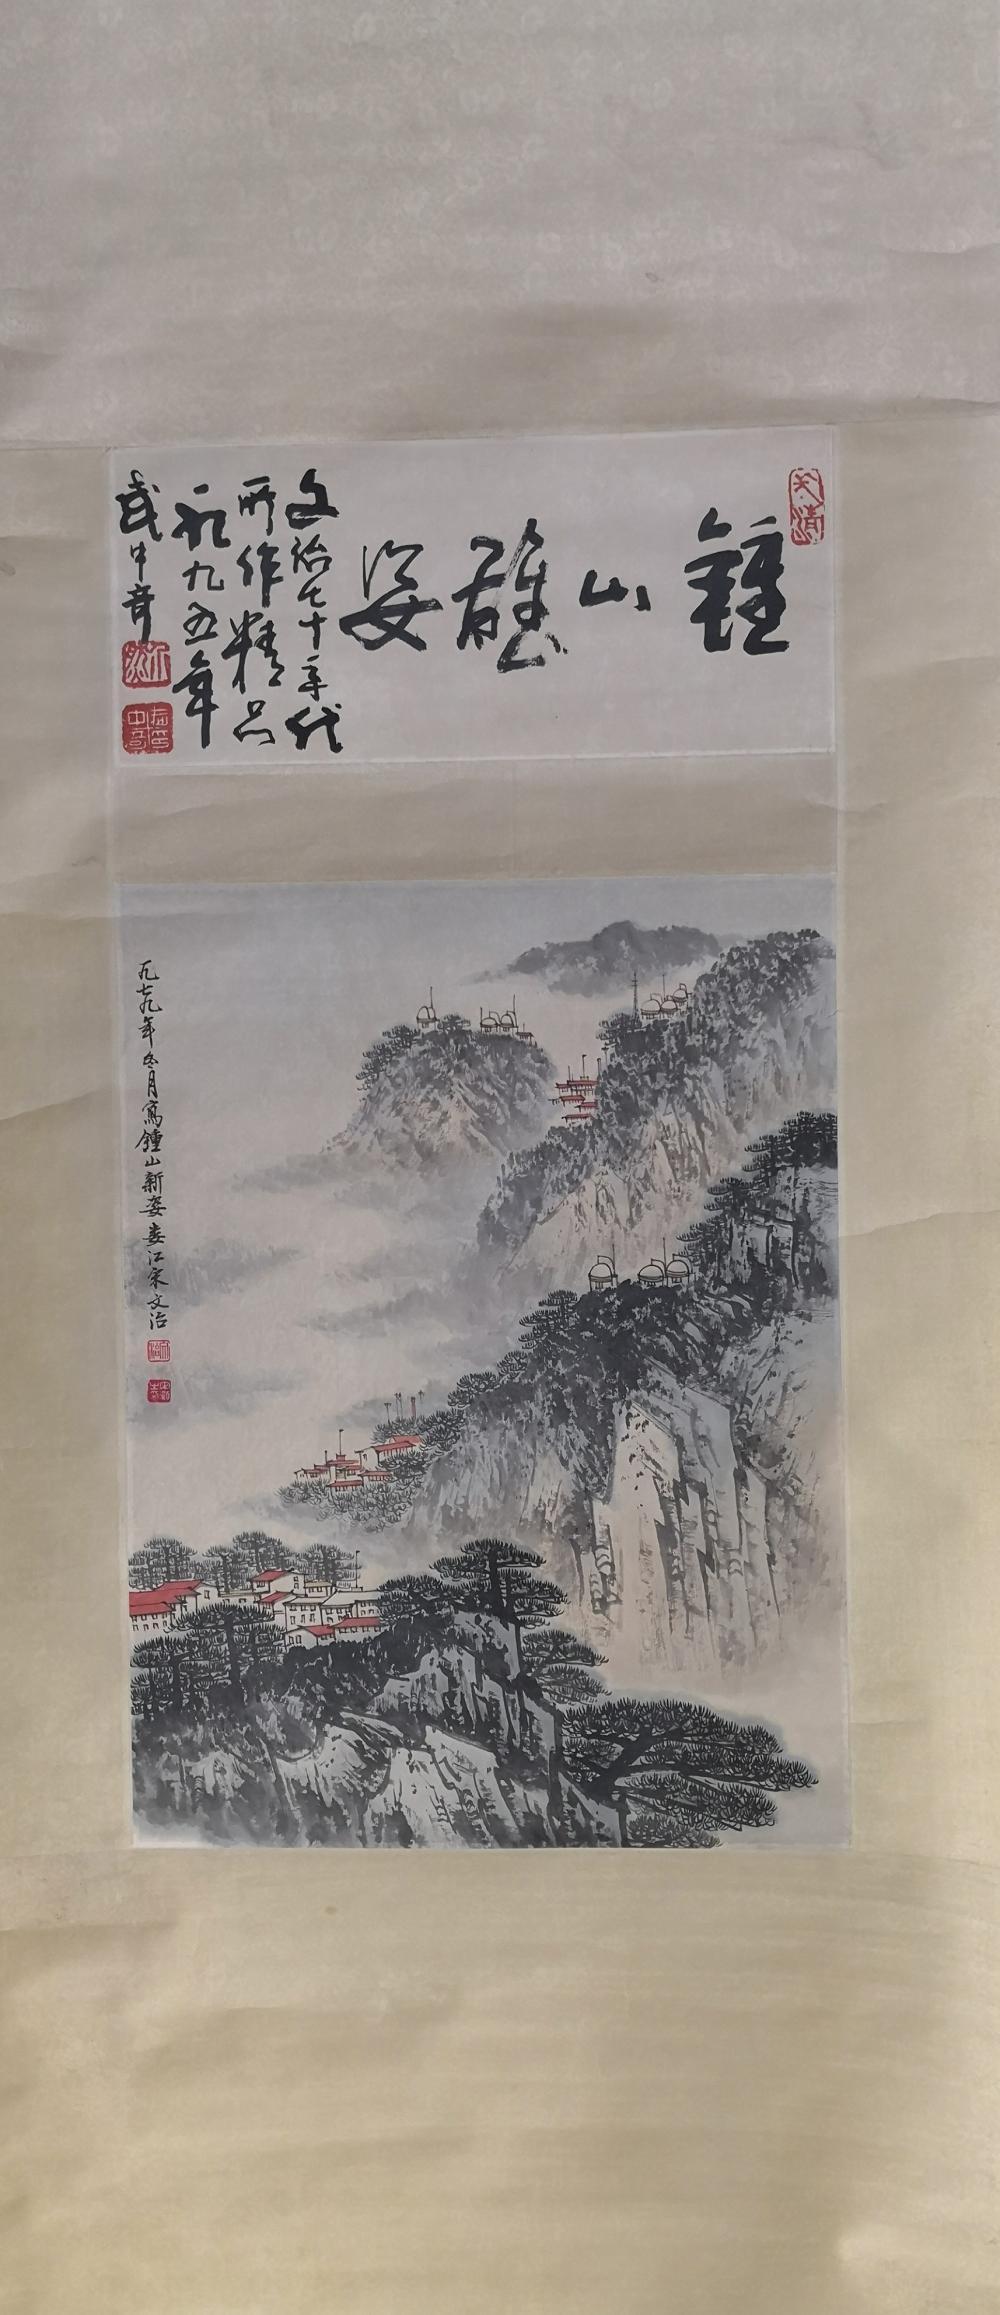 A CHINESE PAINTING BY SONG WENZHI; WU ZHONGQI